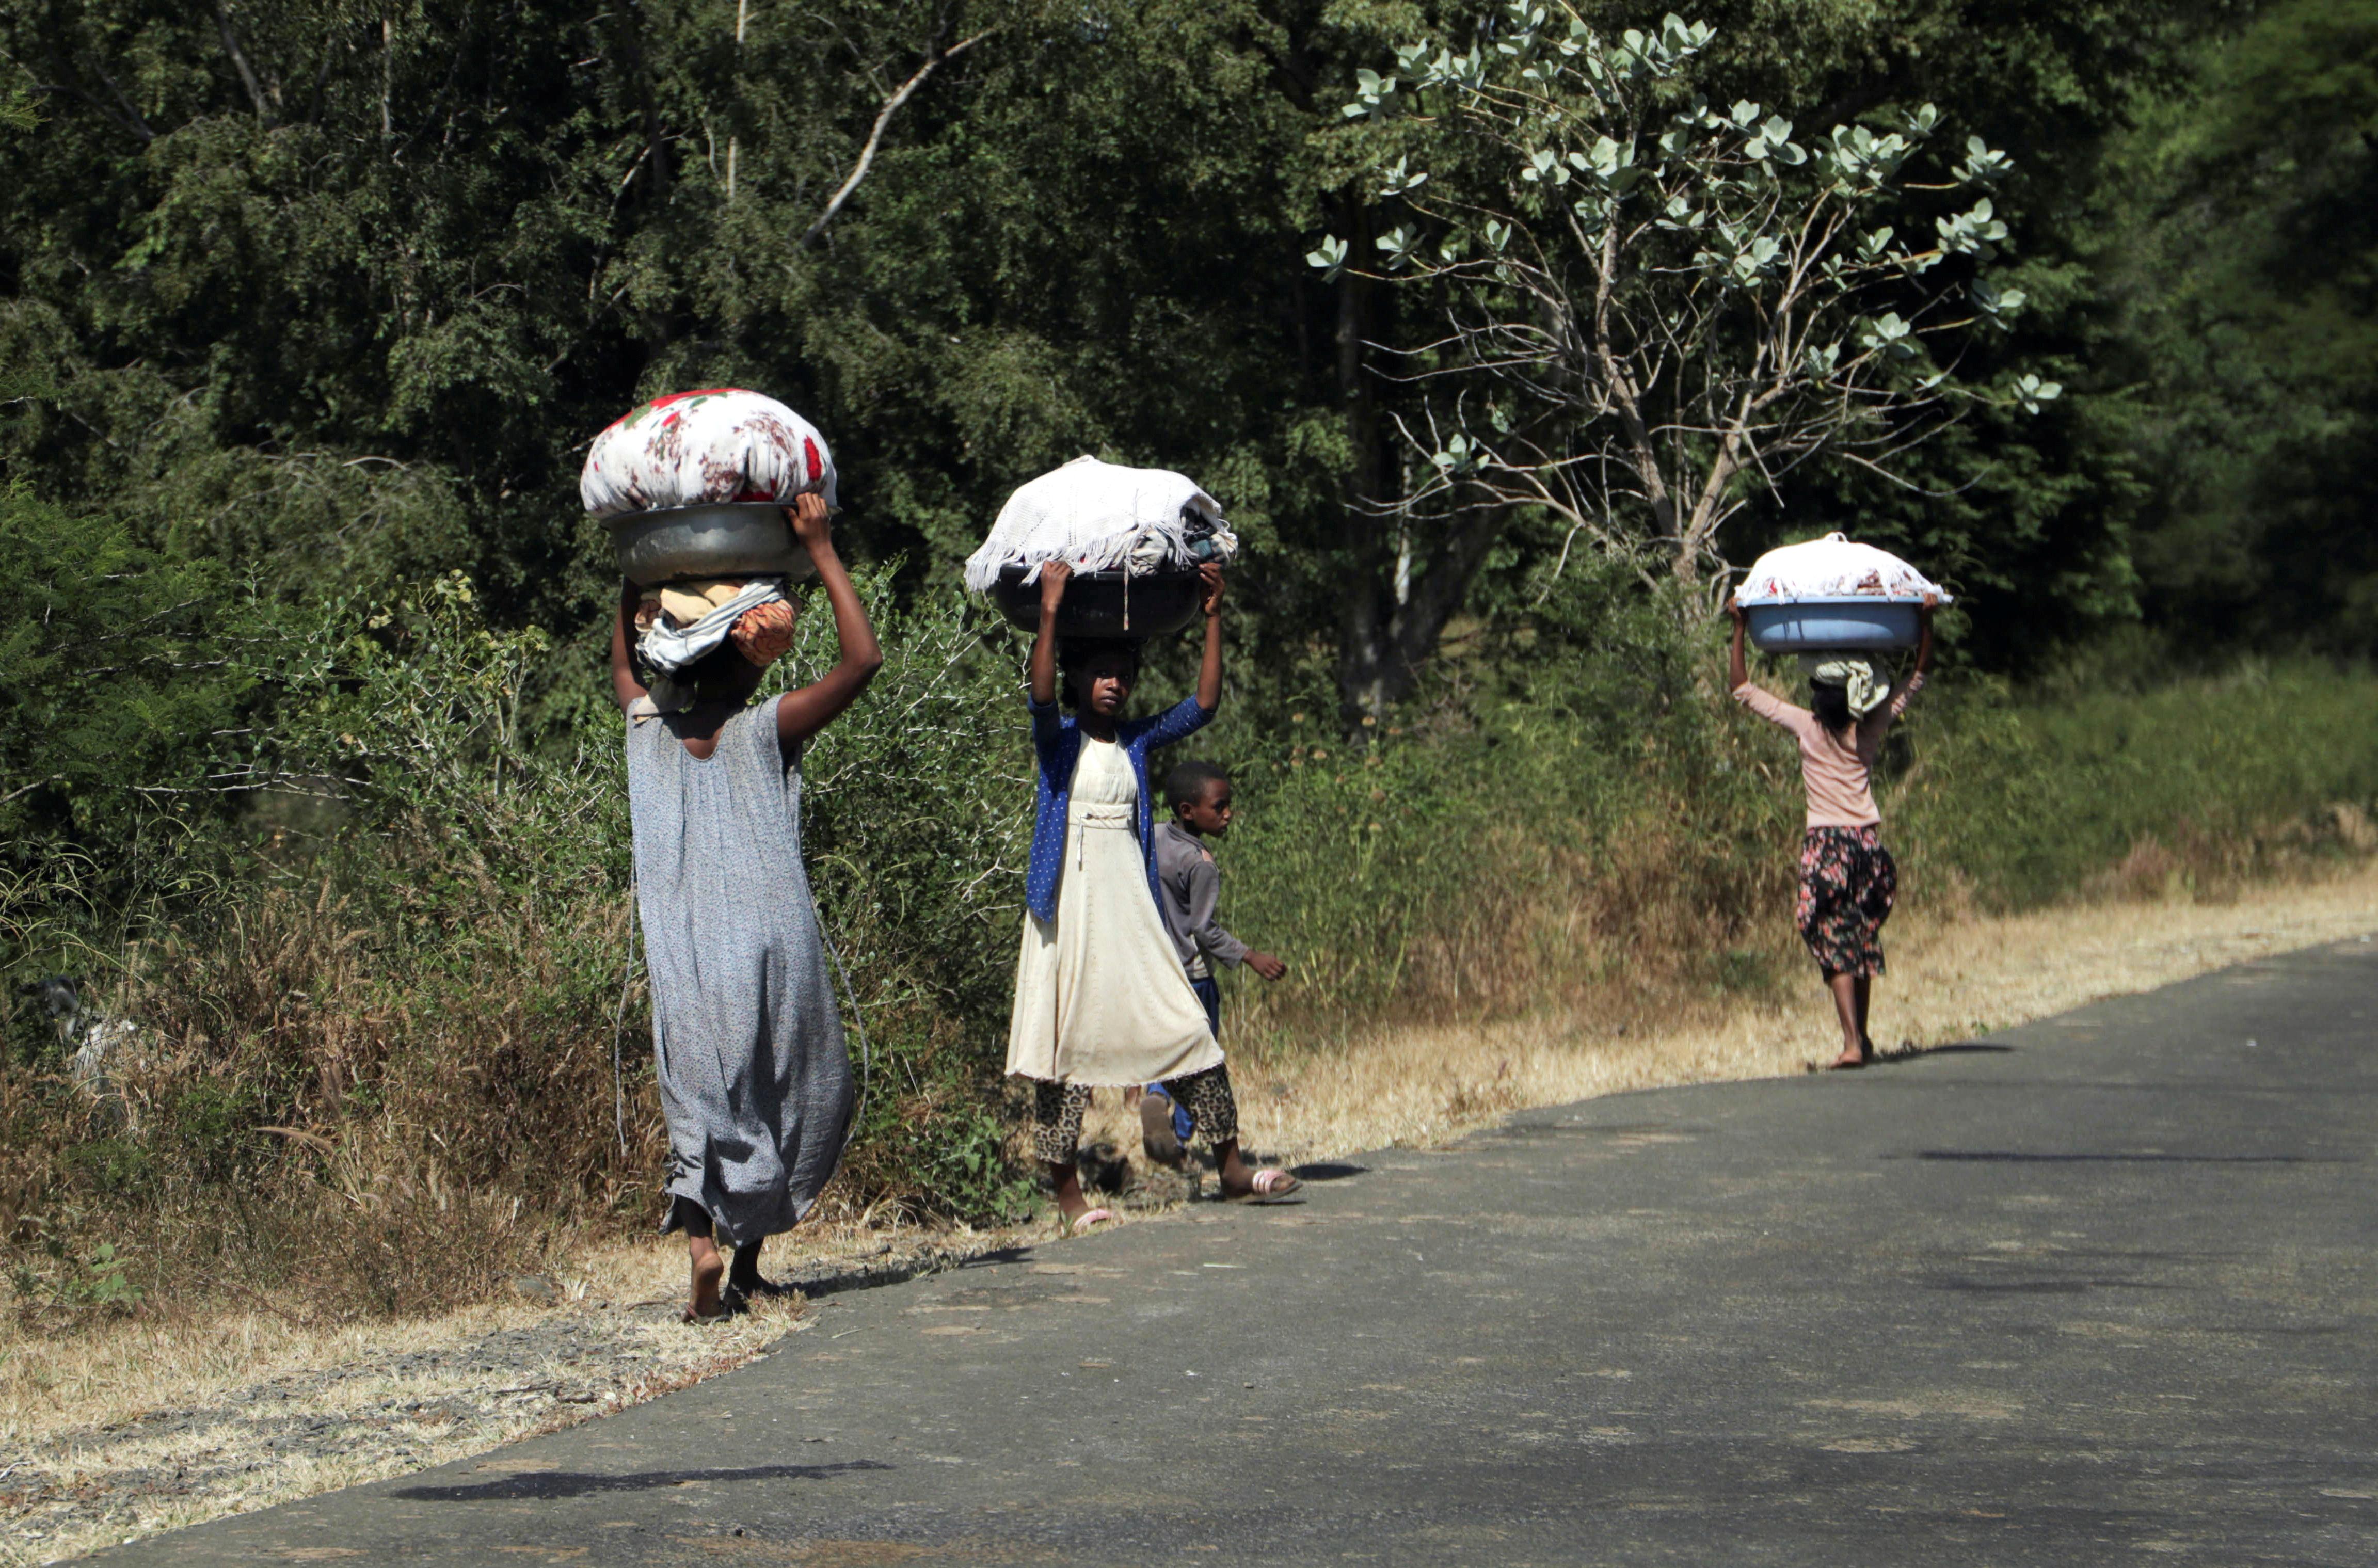 Girls carry laundry in Soroka town in Amhara region near a border with Tigray, Ethiopia November 9, 2020. REUTERS/Tiksa Negeri/File Photo